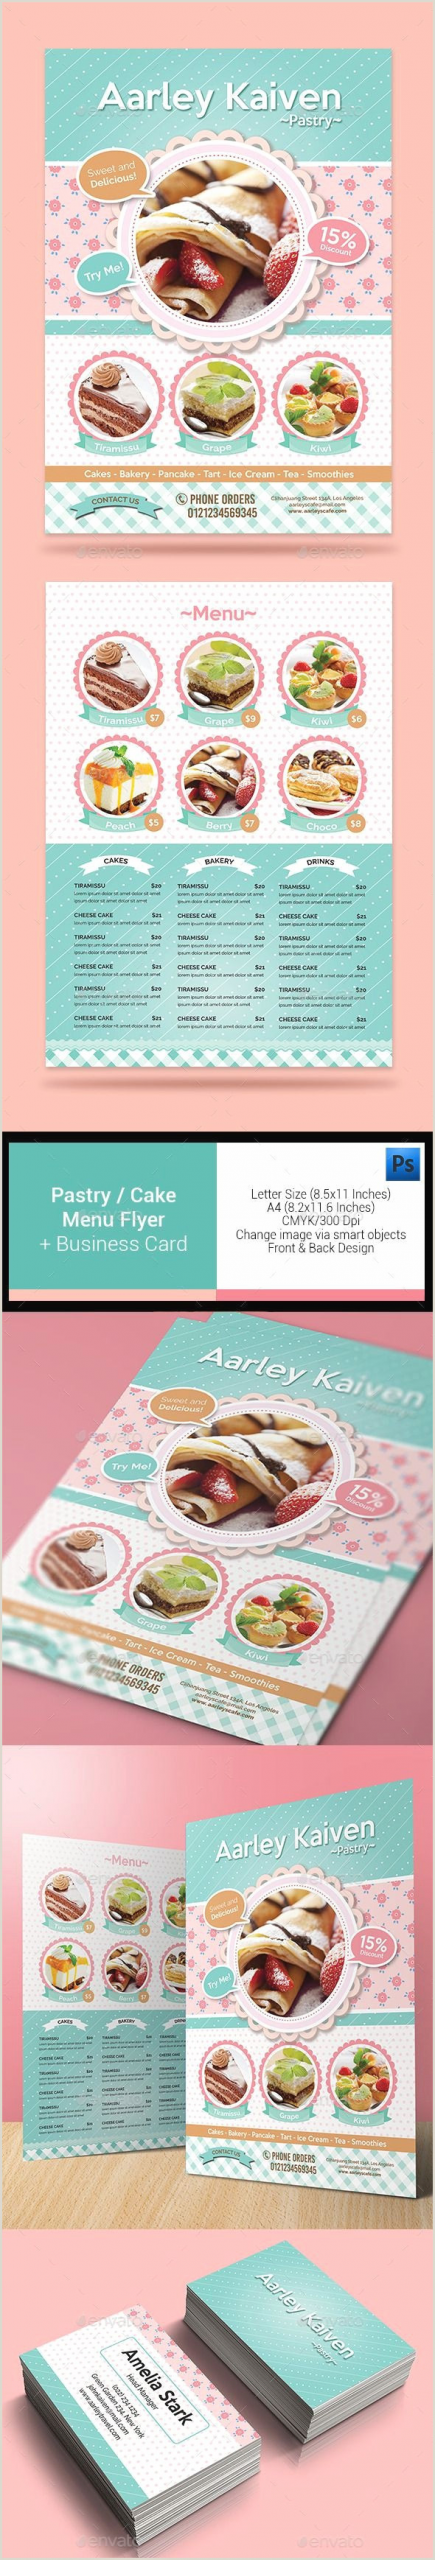 Unique Business Cards Business Card Templates Apocalomegaproductions